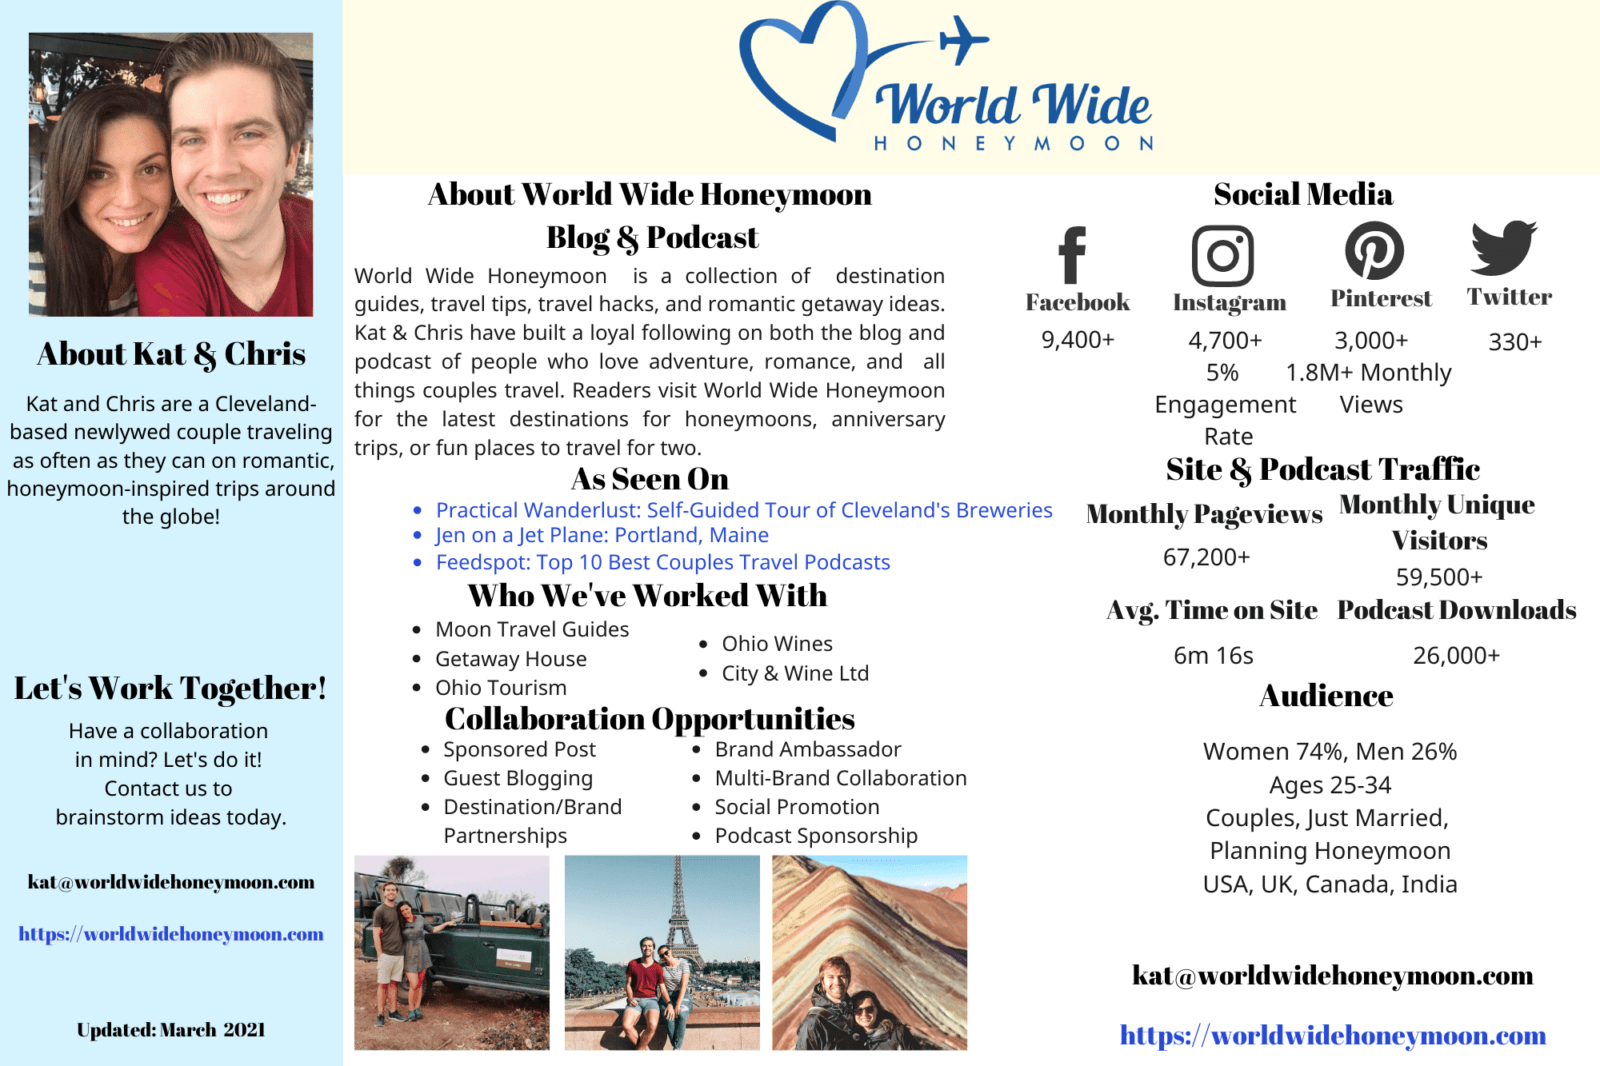 World Wide Honeymoon Media Kit